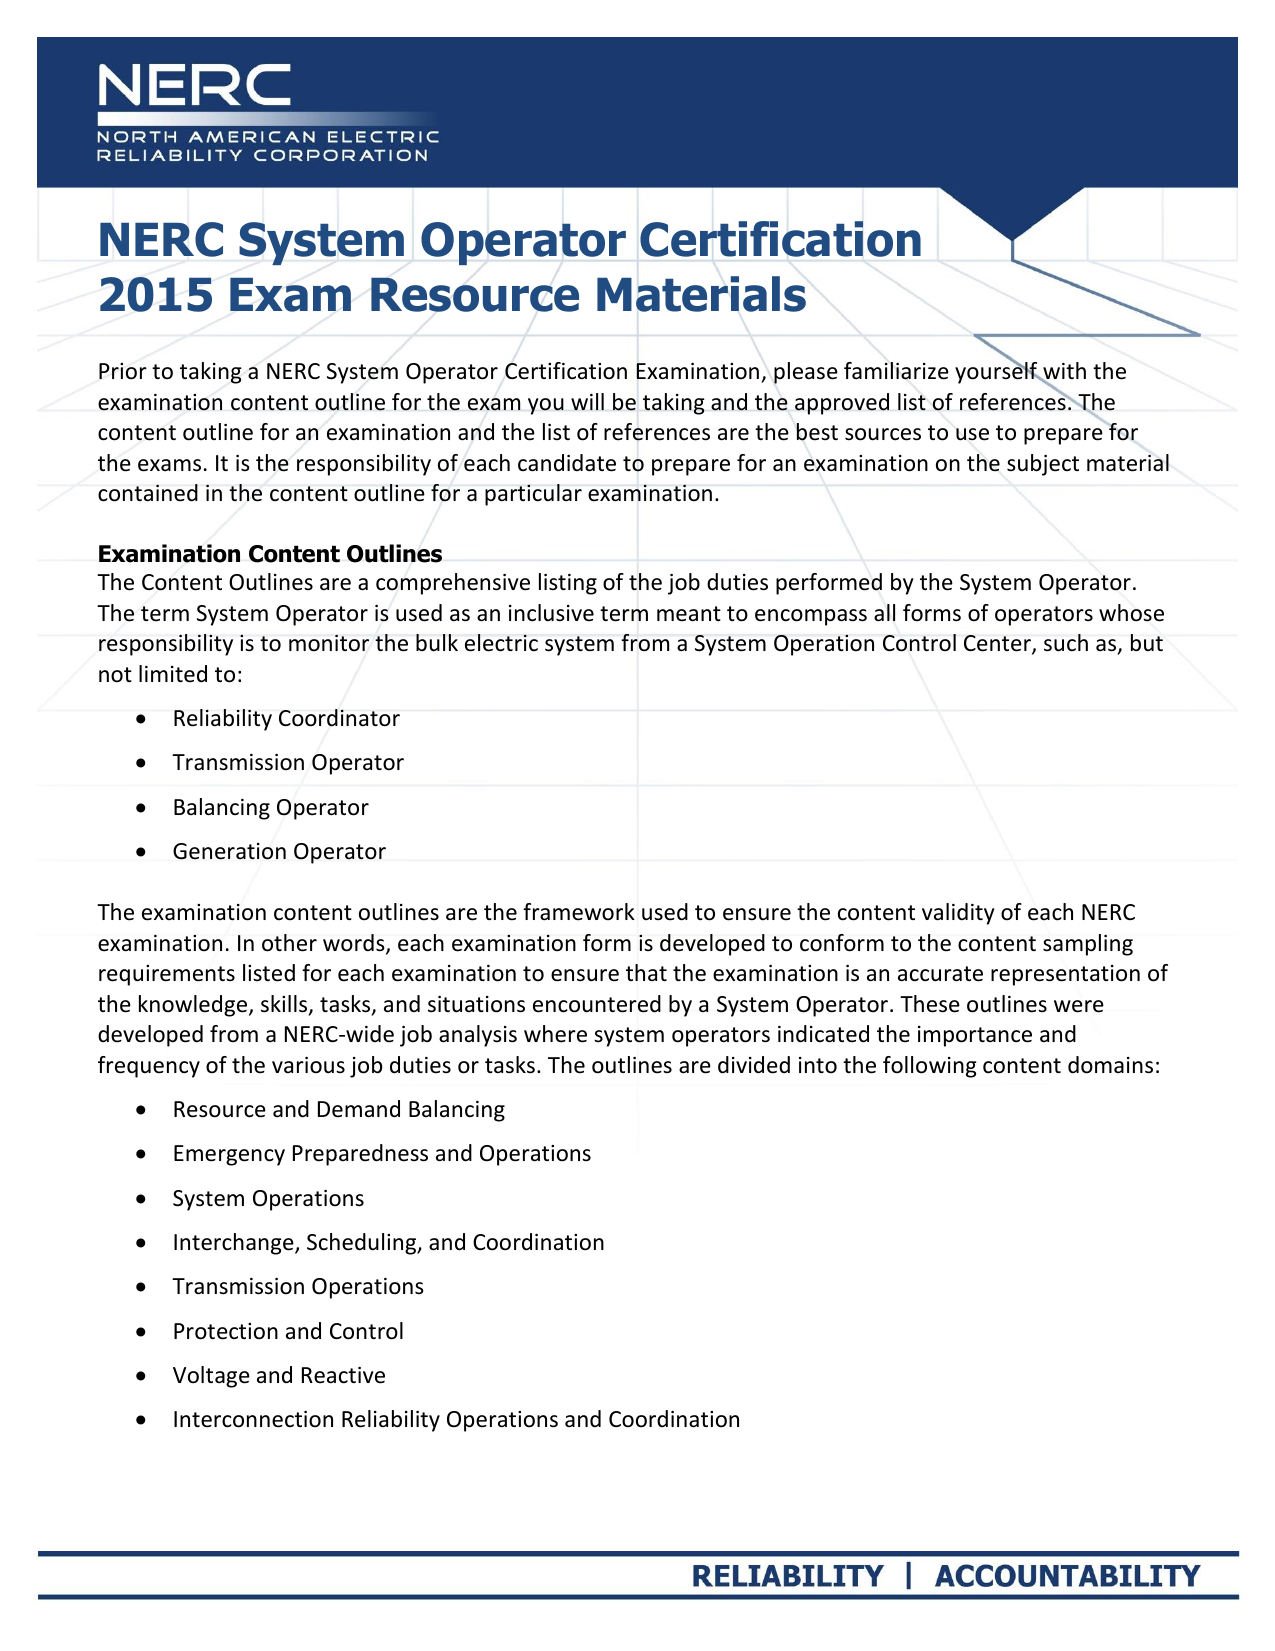 Nerc System Operator Certification 2015 Exam Resource Materials